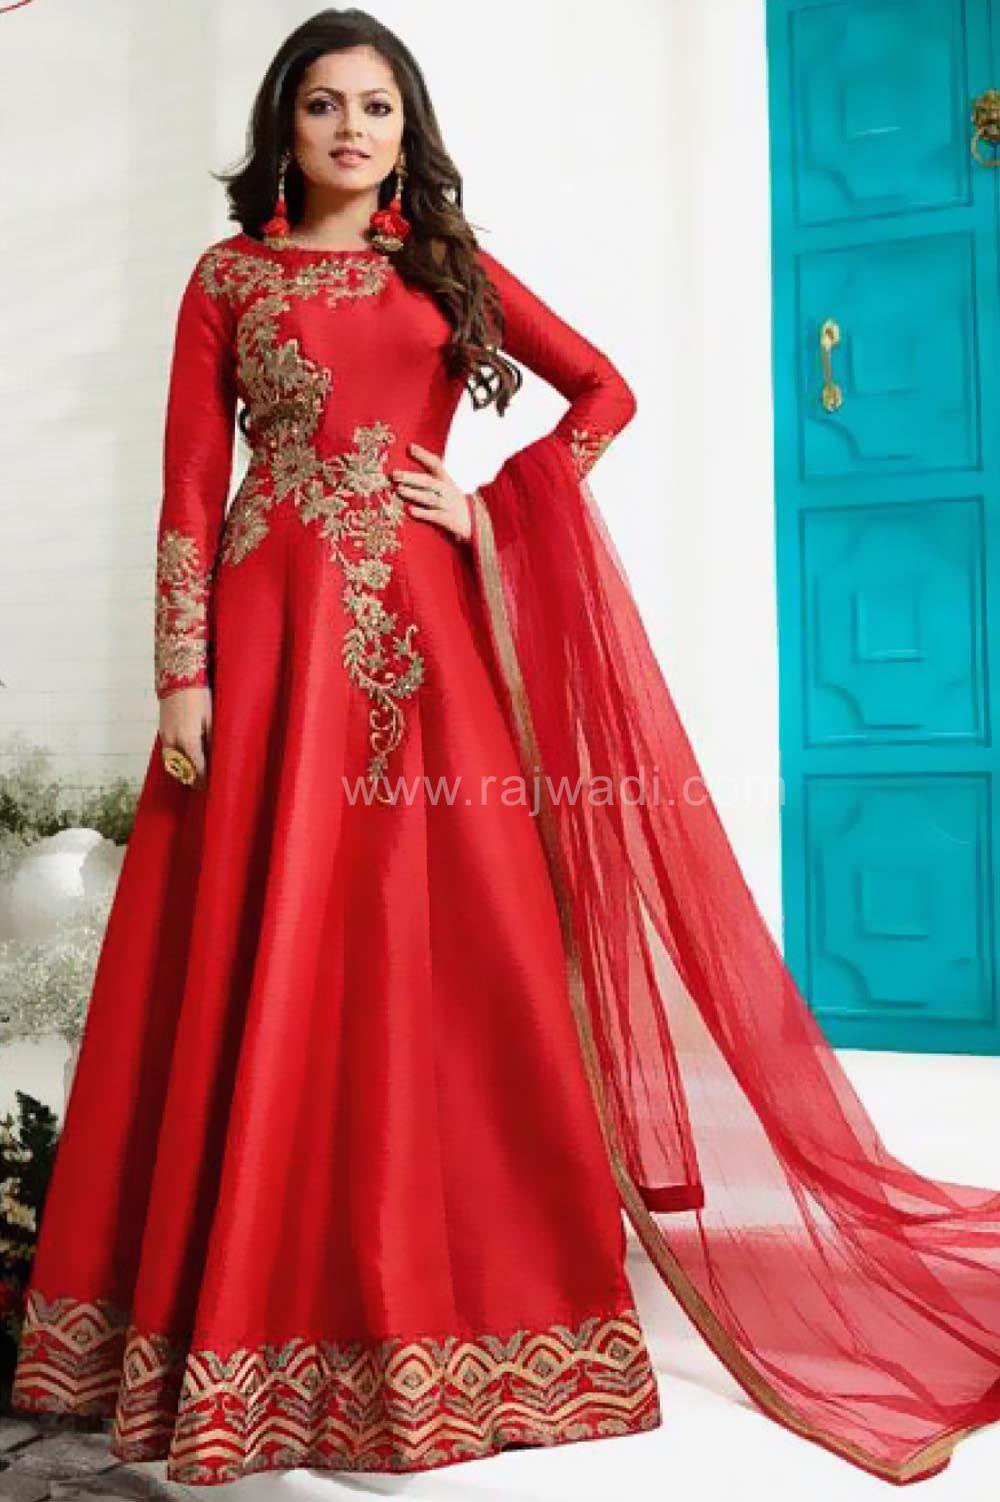 7062c0f6ab Floor Length Red Drashti Dhami Dress Material... #DrastiDhami #rajwadi  #designer #ethnic #eidsalwarkameezmaterial #eidspecialdresses  #WomensSuitsforEid # ...